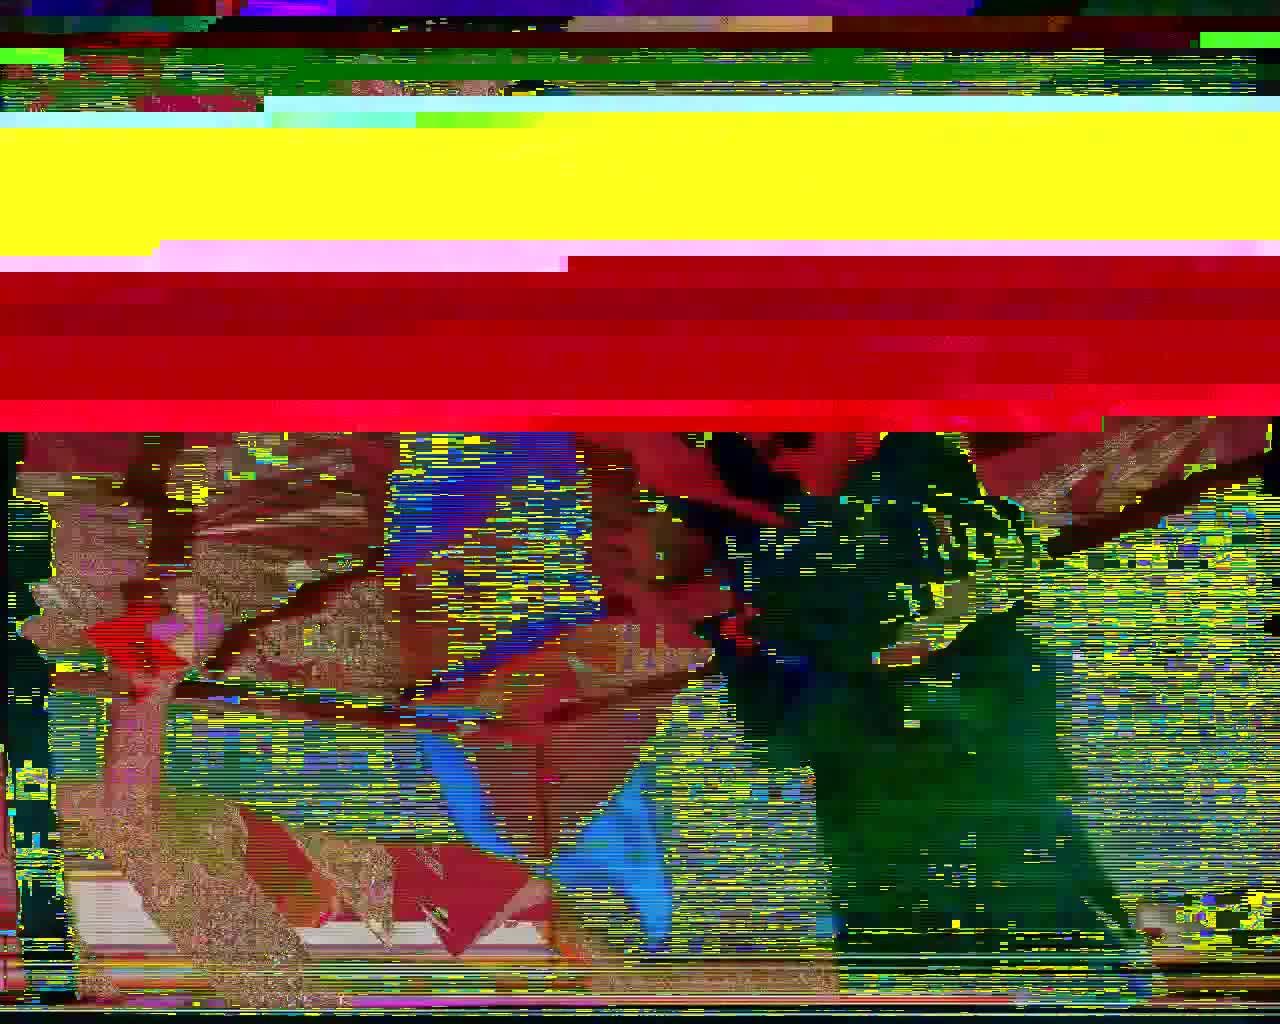 projection_001.jpg